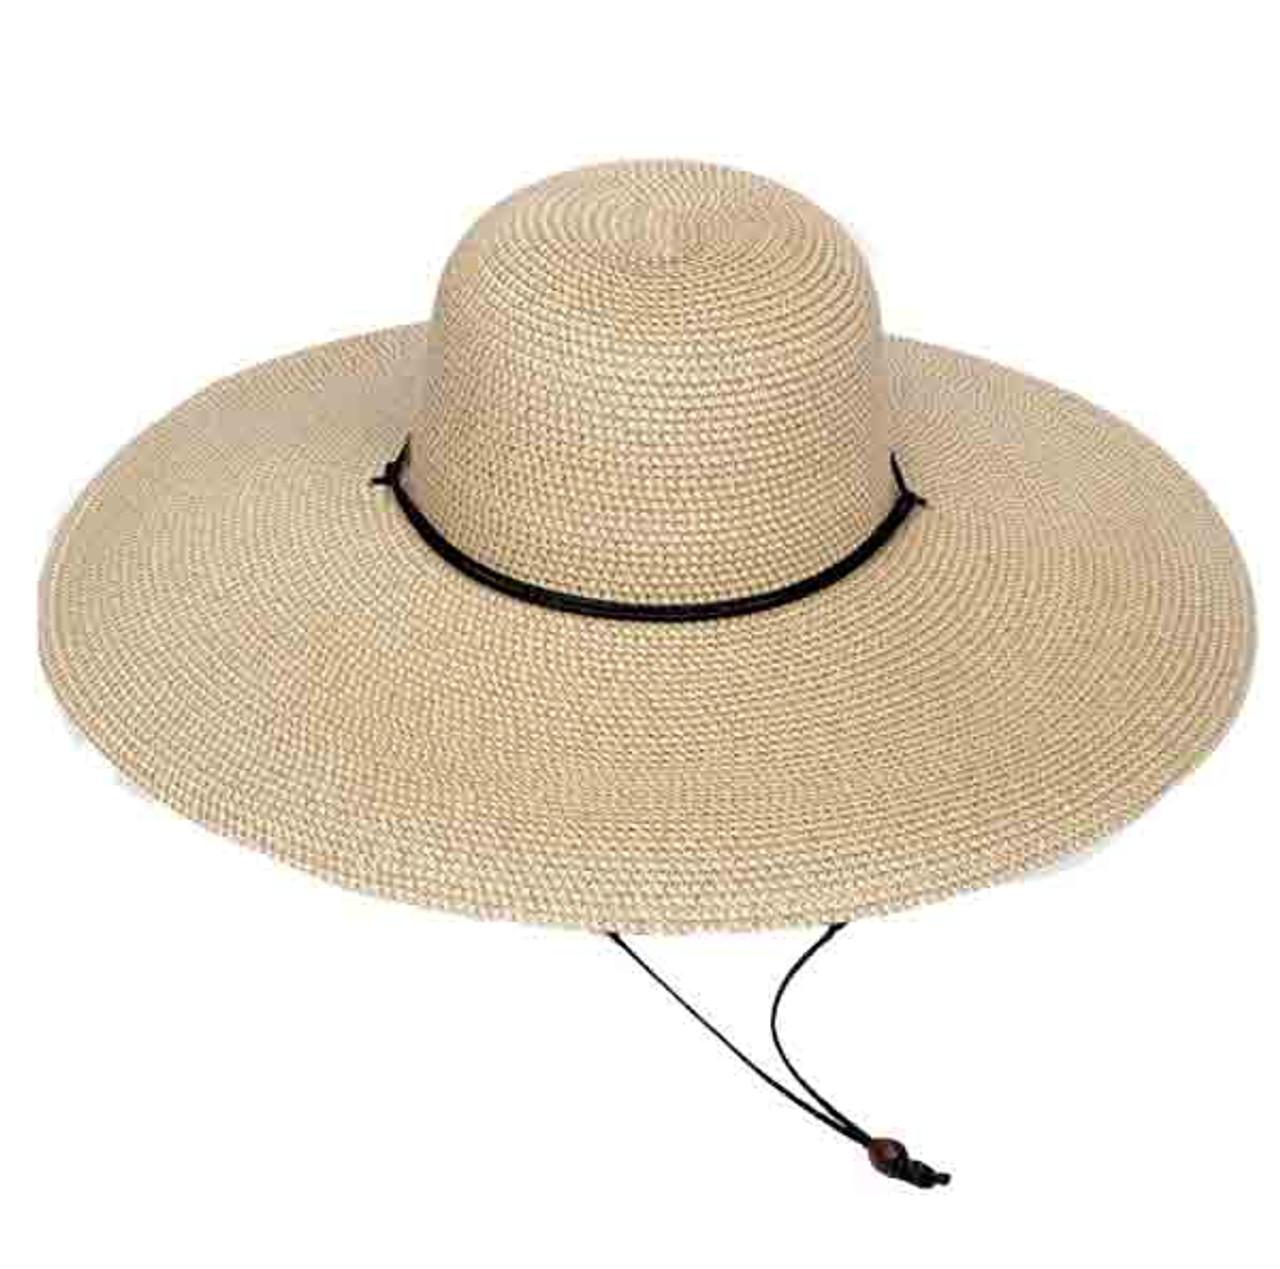 57a575716 Sun 'N' Sand - Sahara Braid Sun Hat